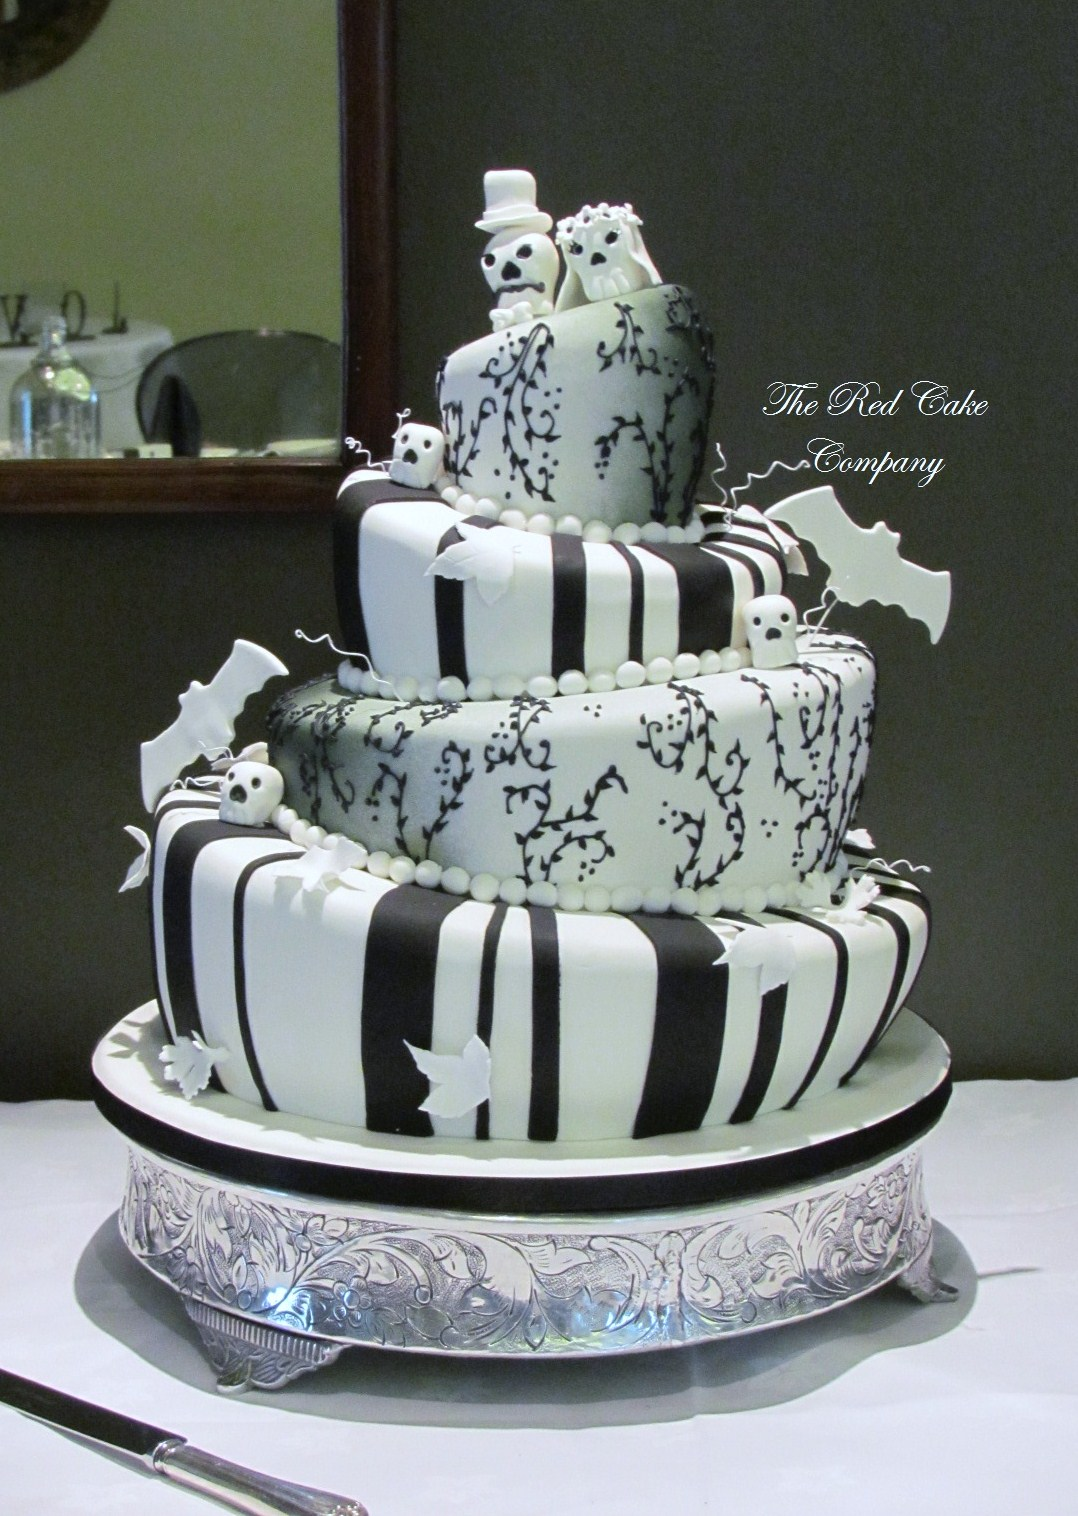 Thursday Cake Day Black Alternative Cake Ideas